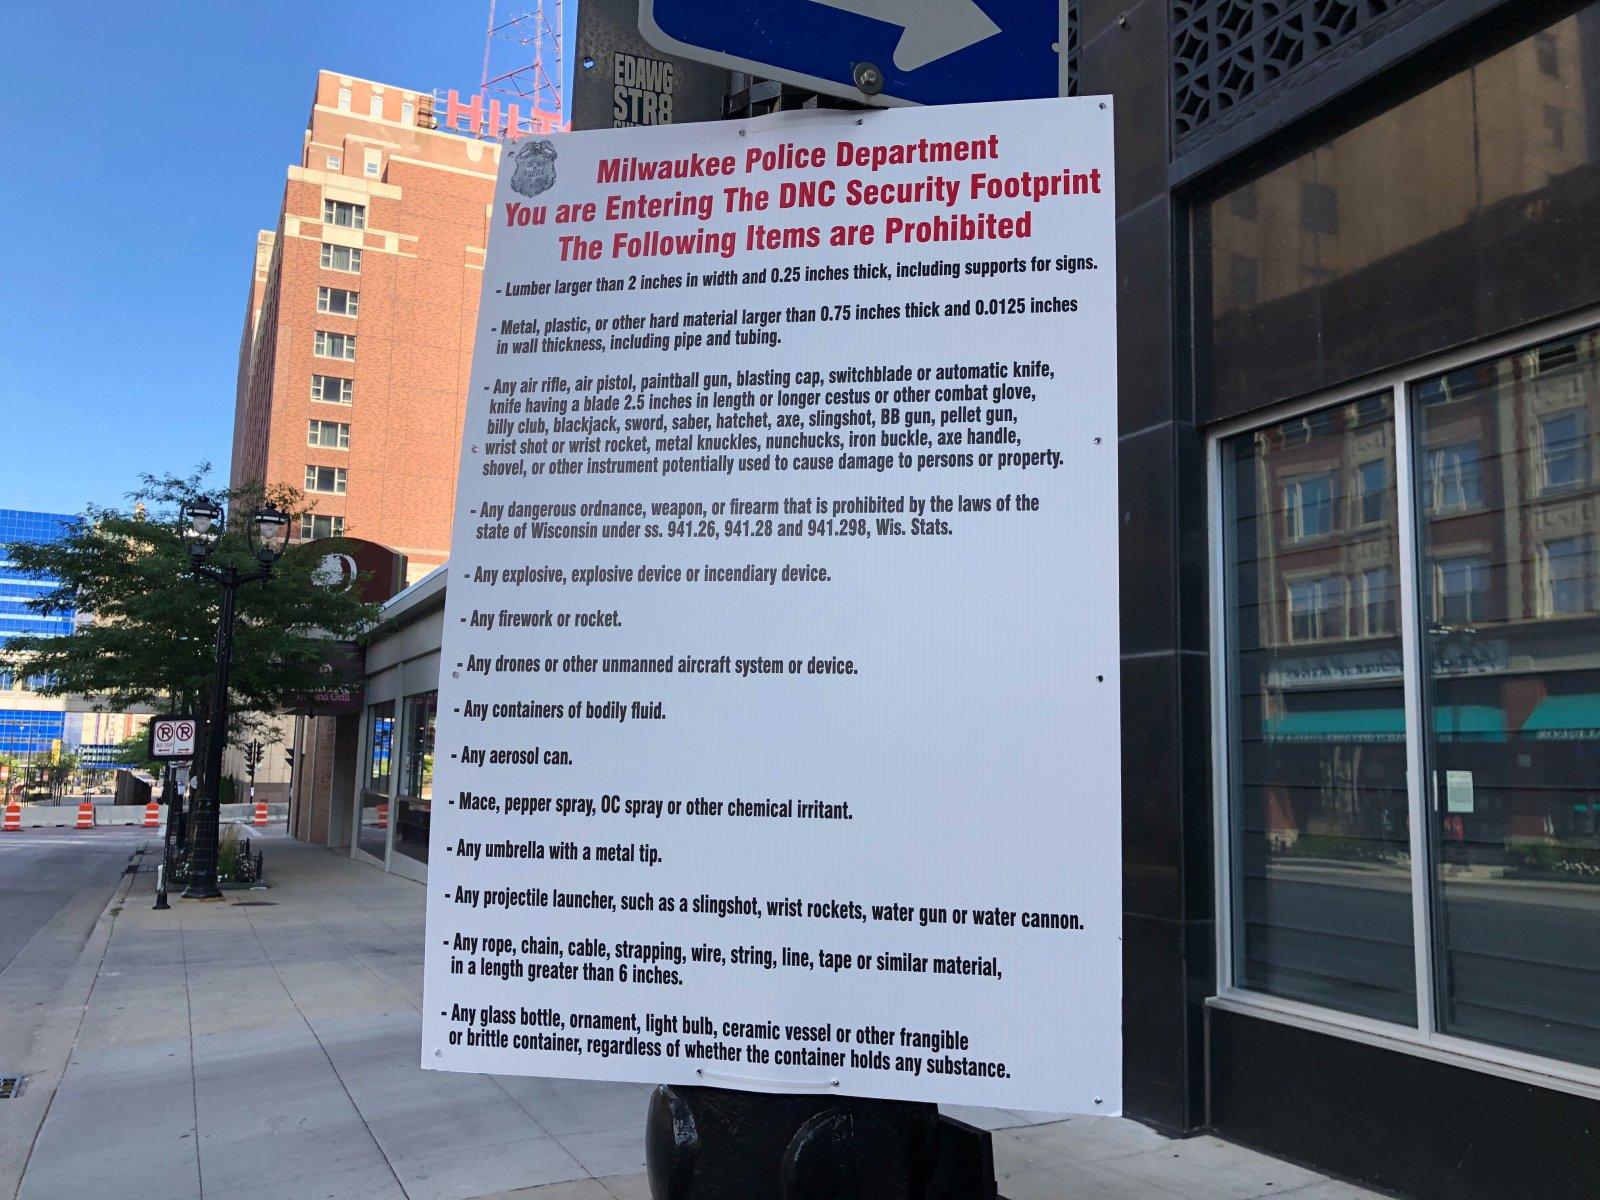 Prohibited Items inside DNC Security Perimeter